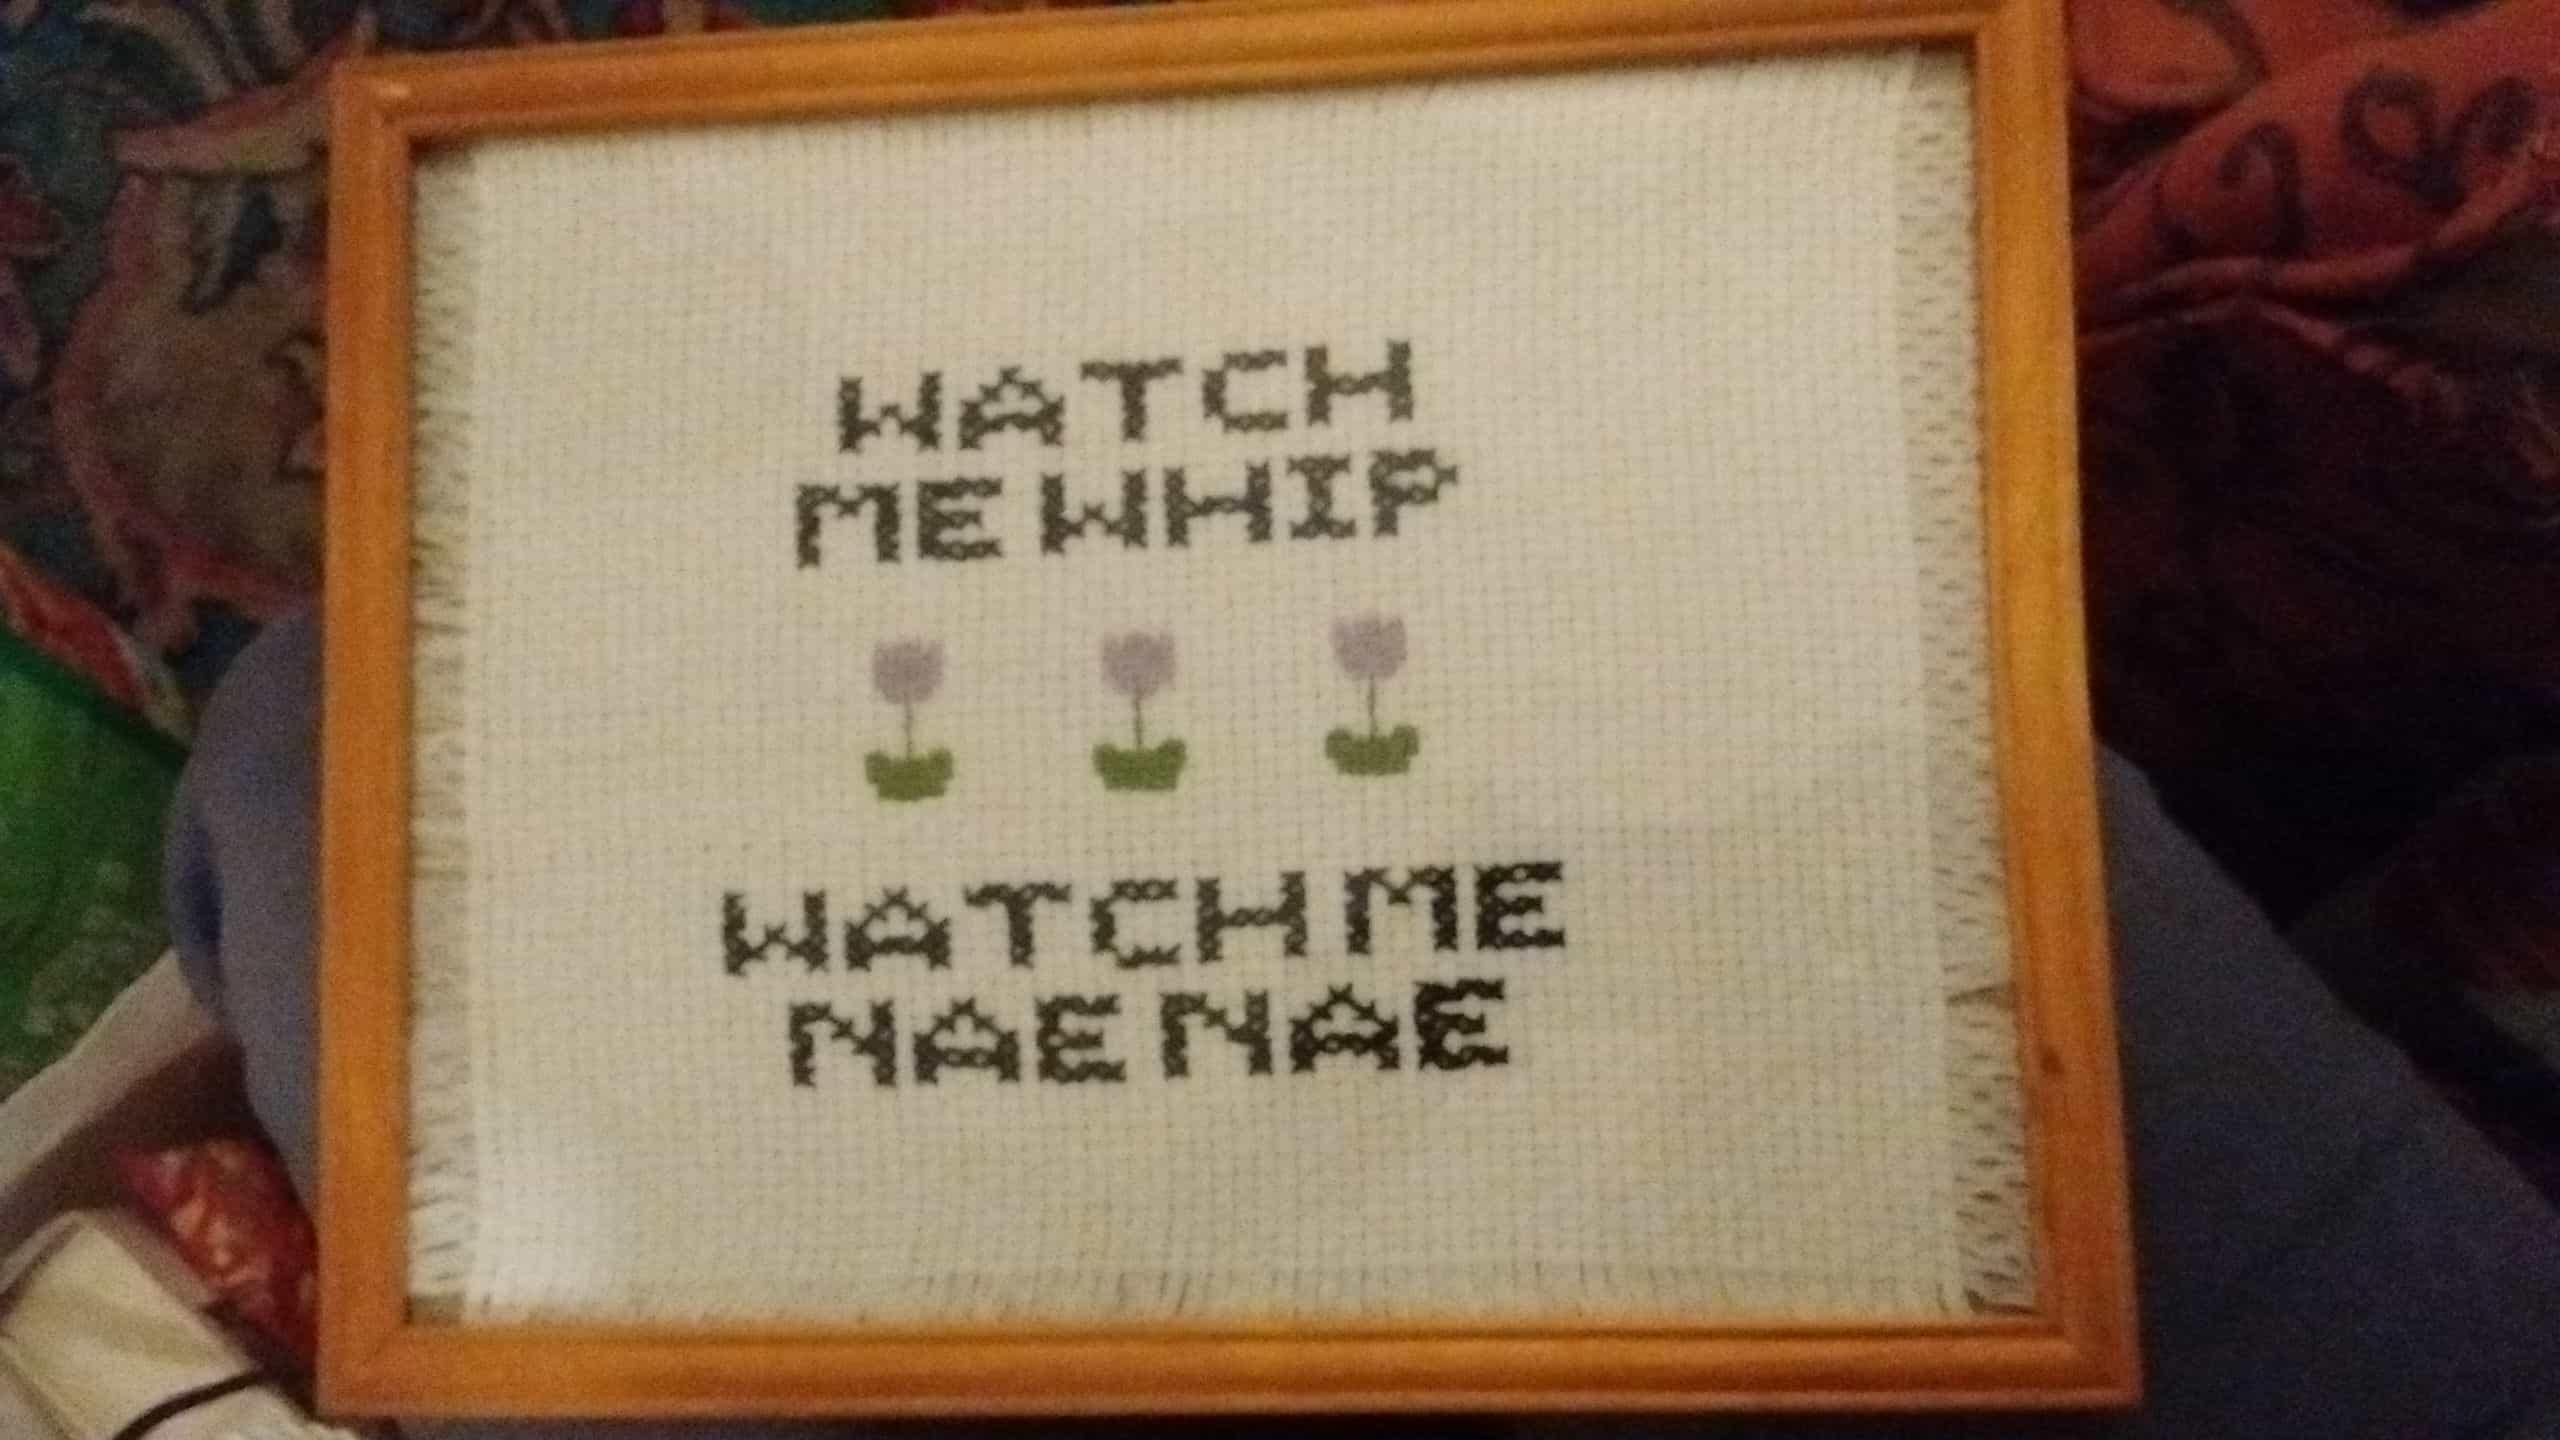 Nae nea cross stitch